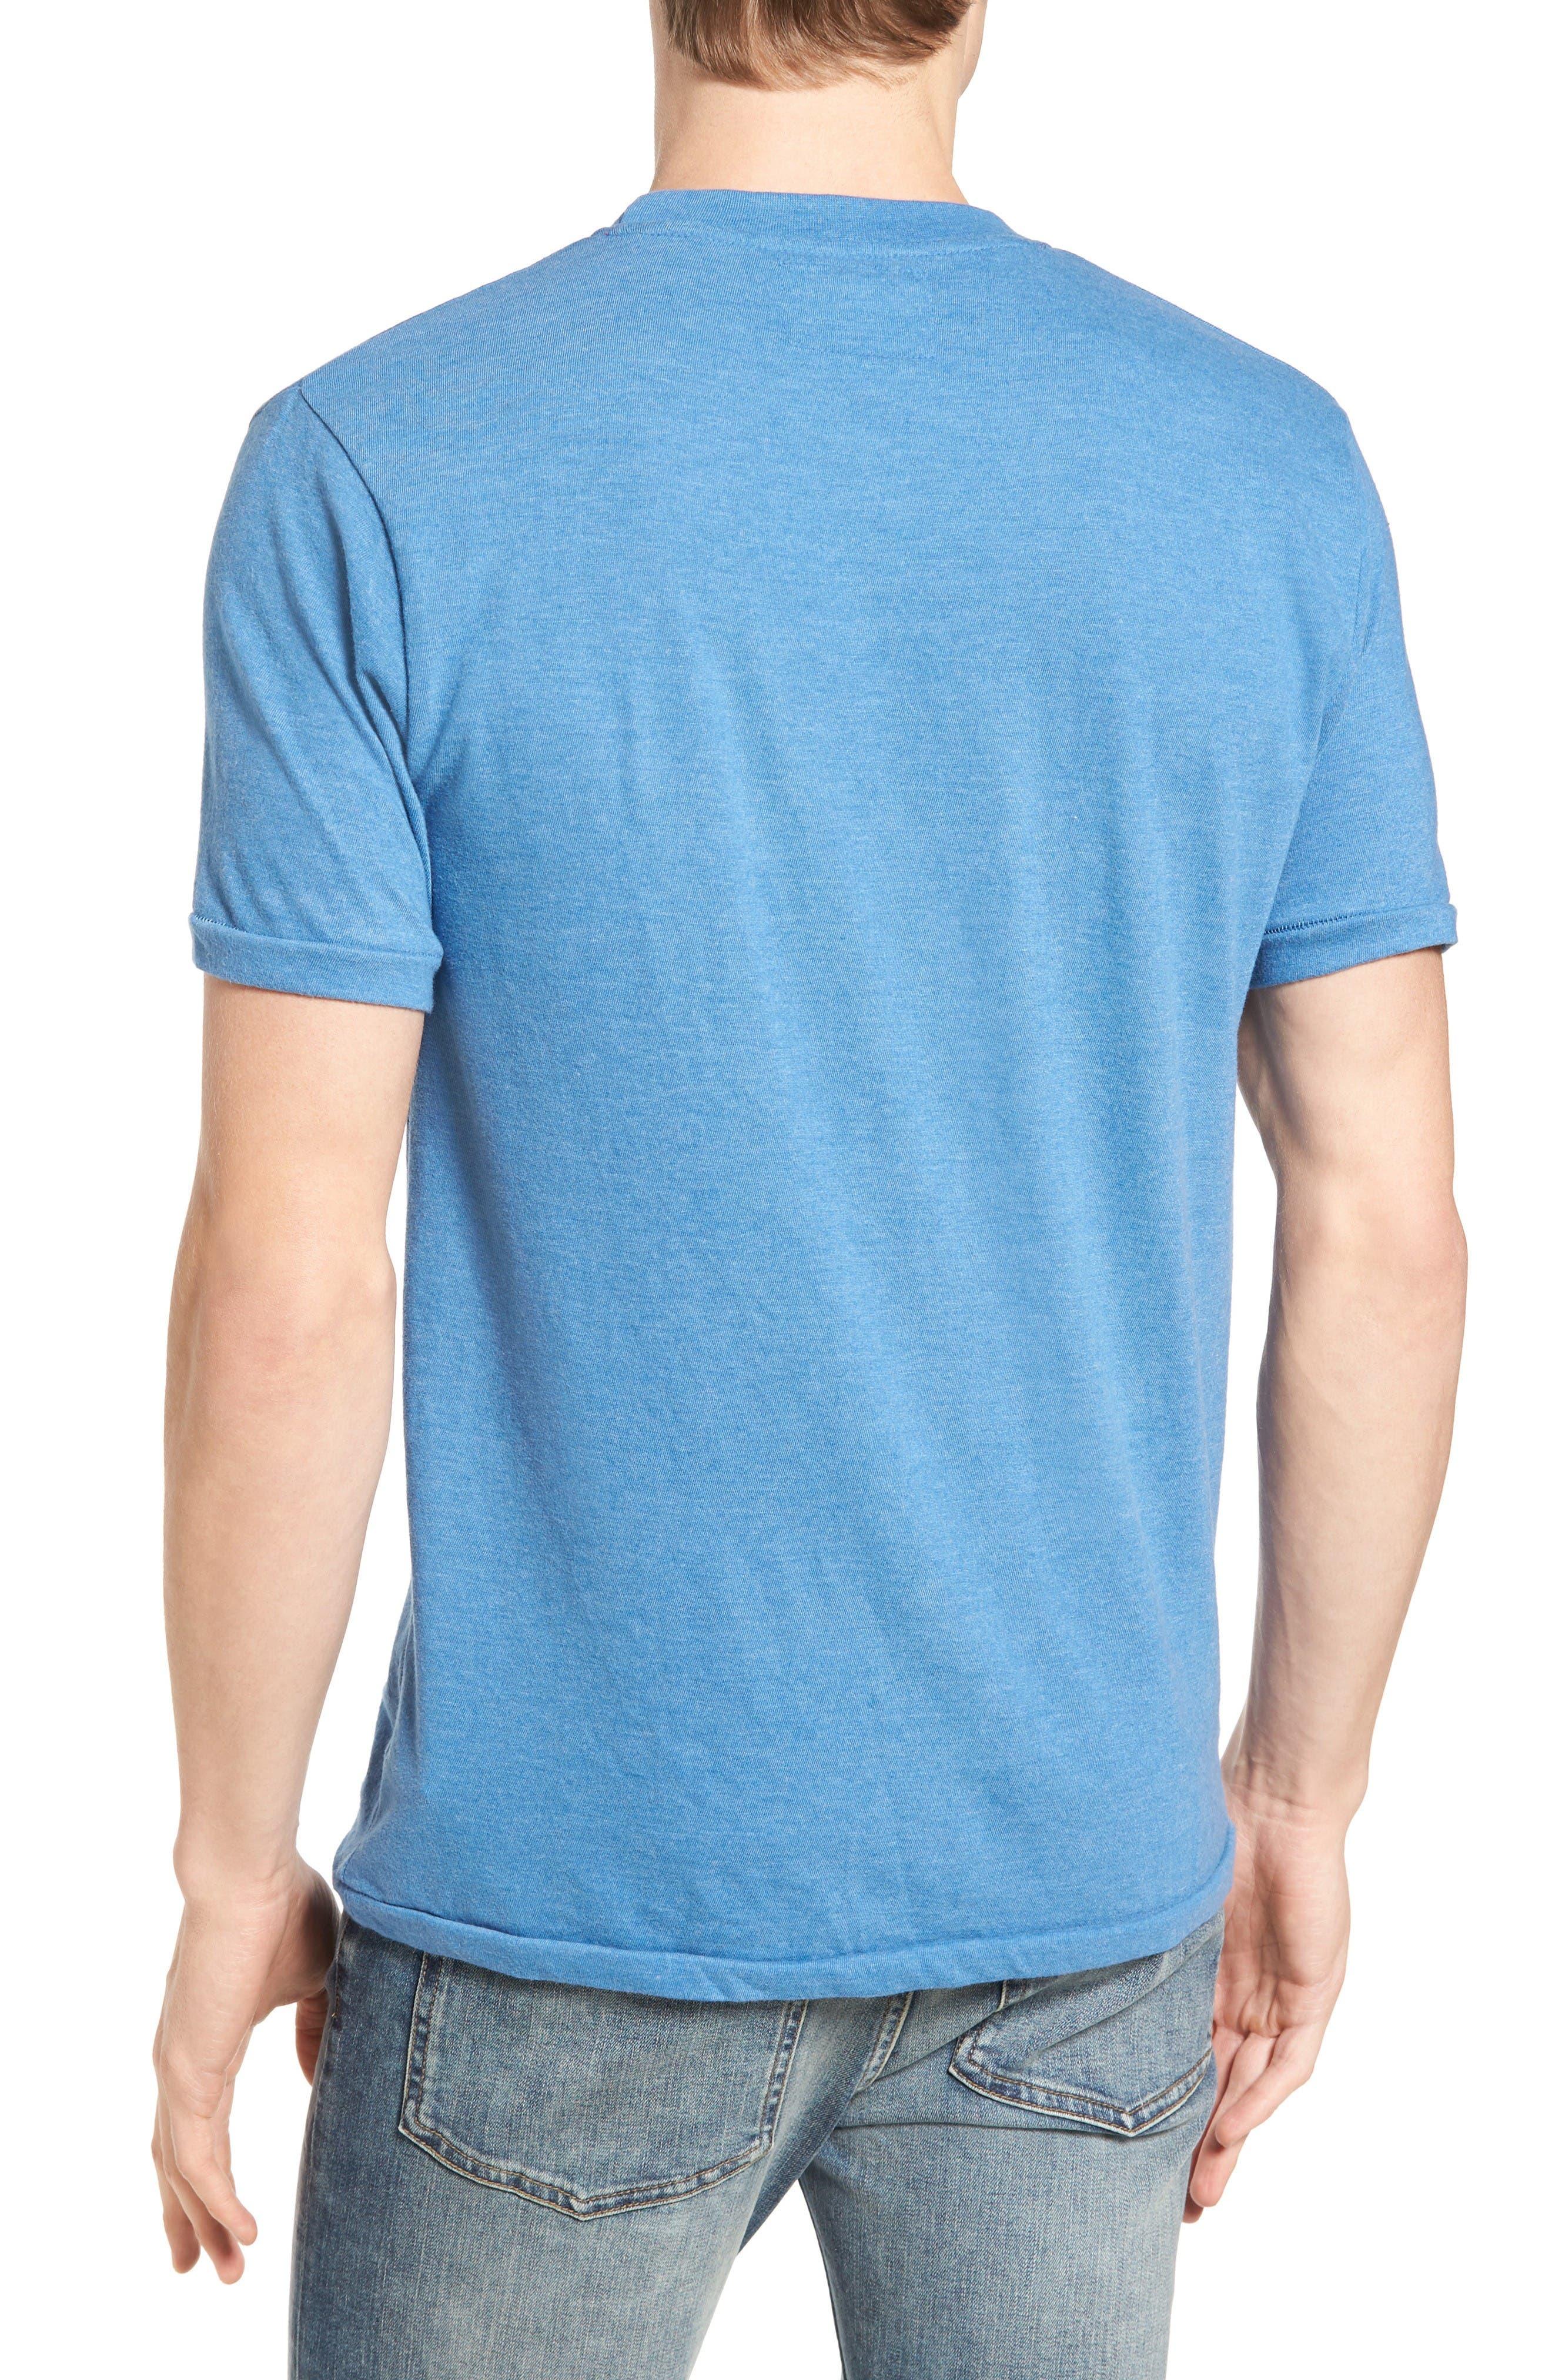 Hillwood Texas Rangers T-Shirt,                             Alternate thumbnail 2, color,                             Royal